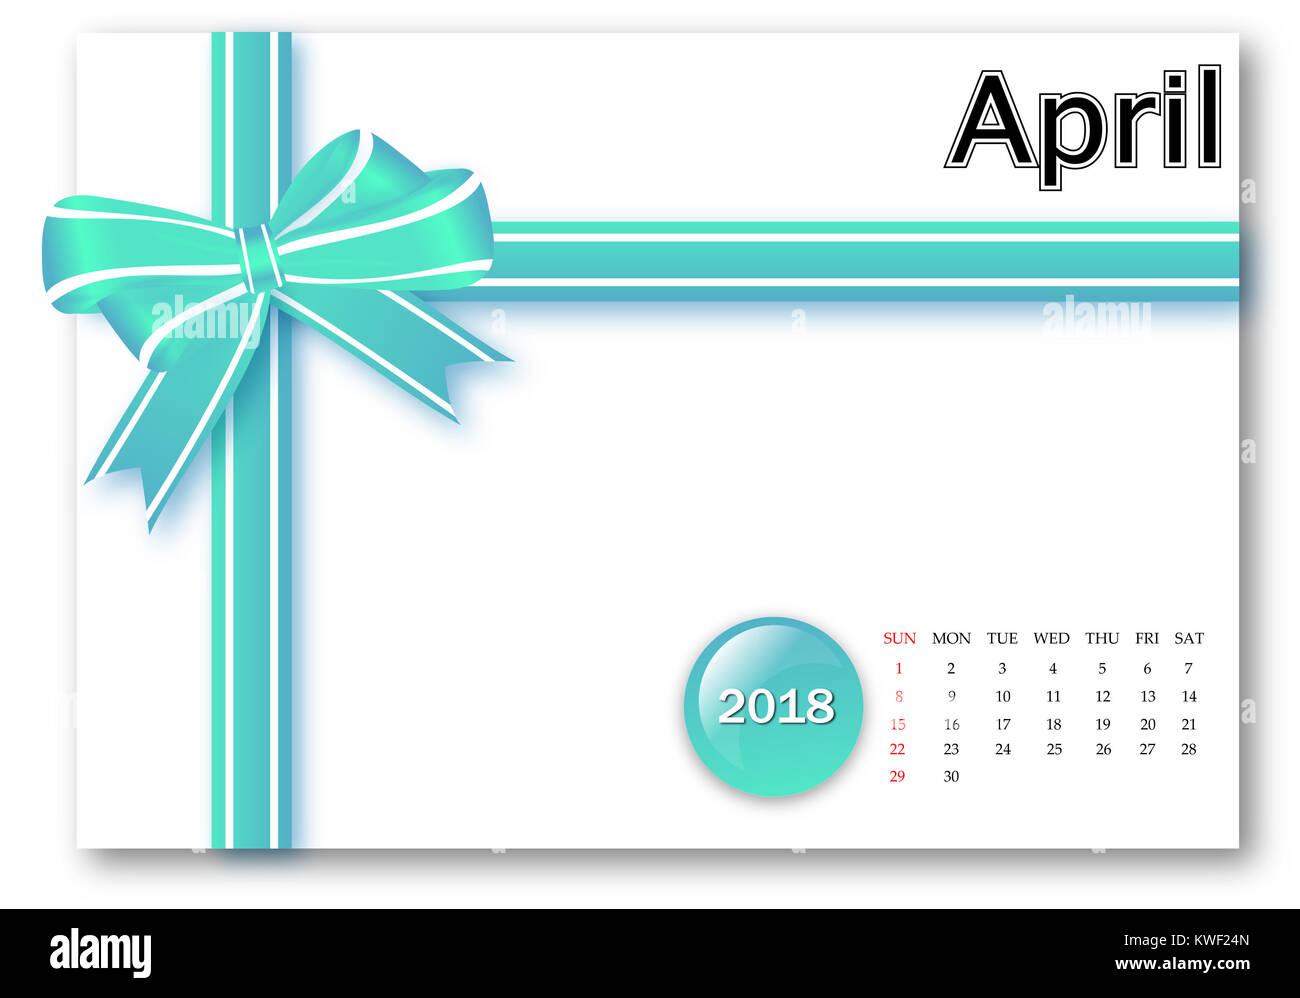 April 2018 - Calendar series with gift ribbon design - Stock Image